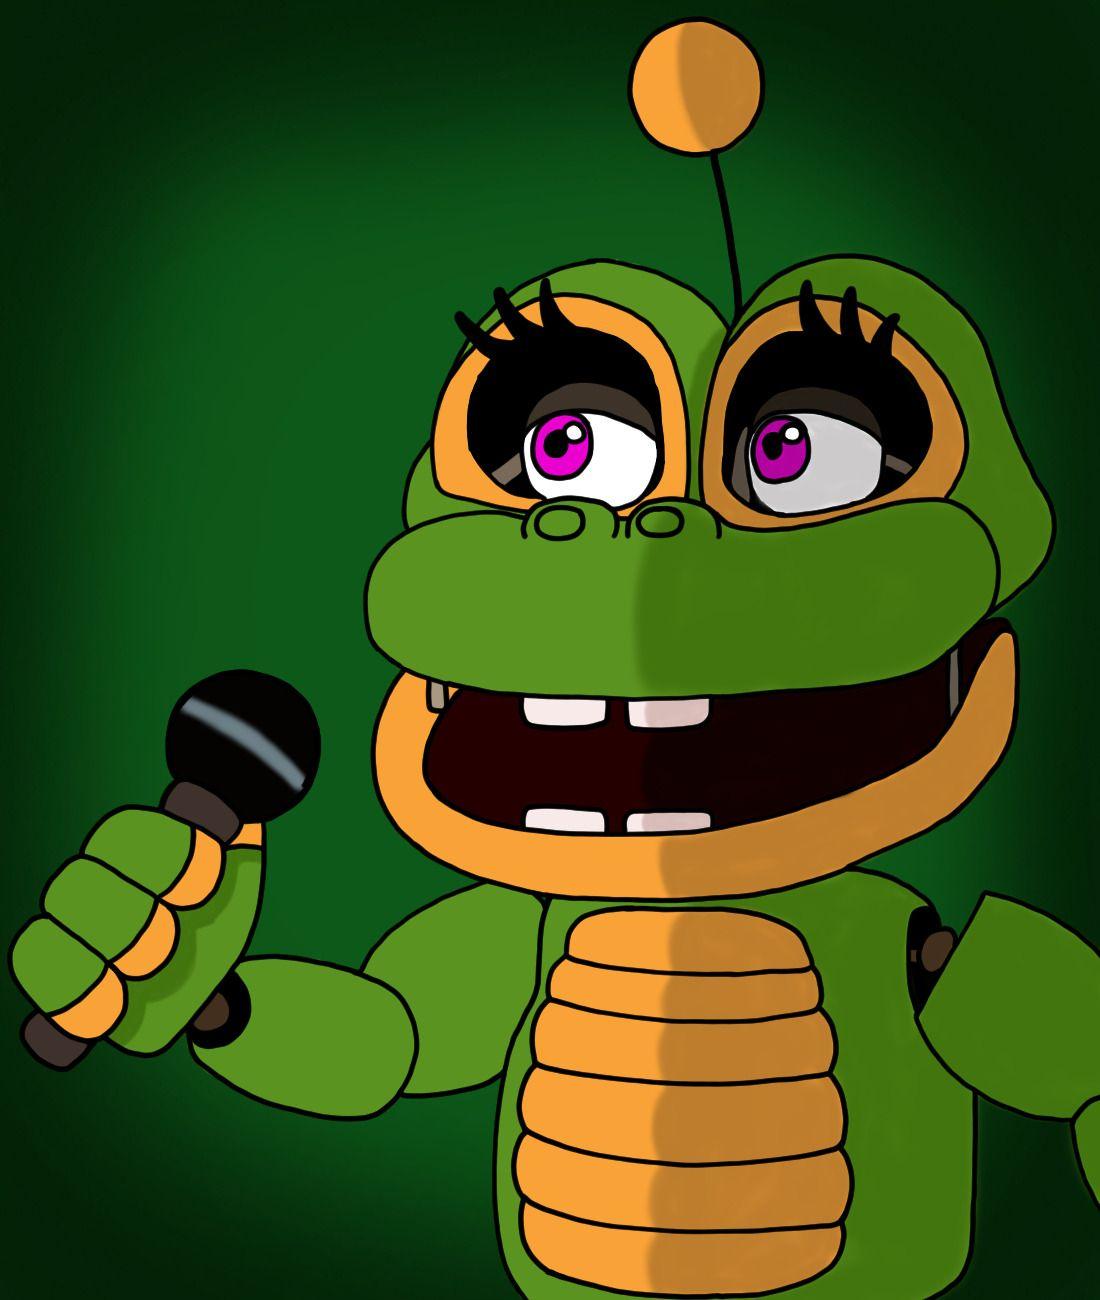 fnaf 6 fnaf five nights at freddy's frog animatronic happy ribbit